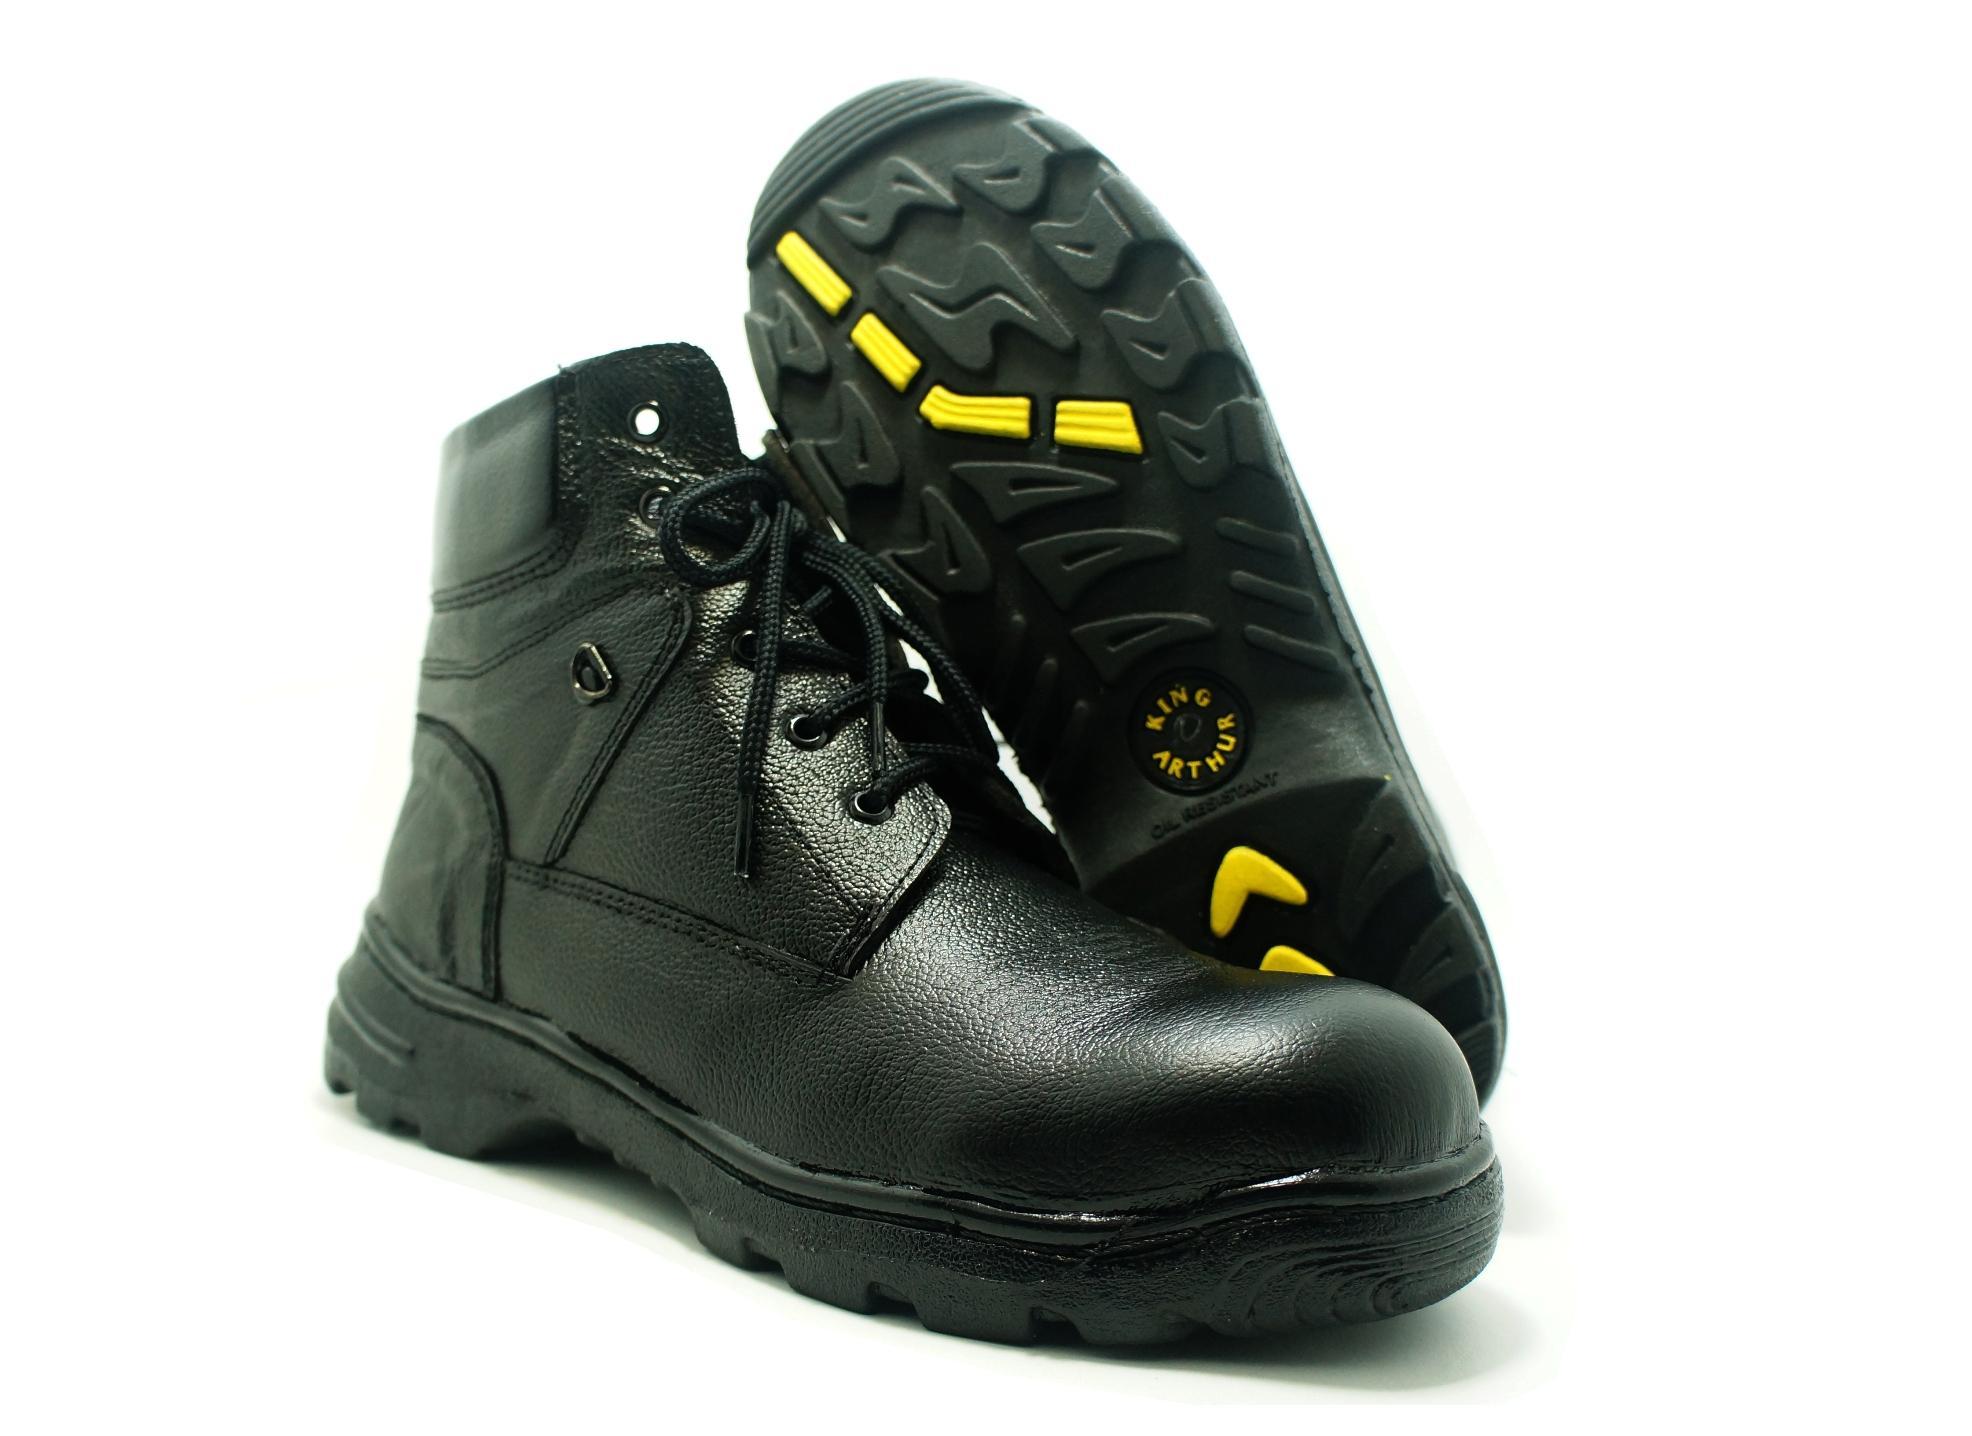 Sepatu Safety Boot Tali King Arthur Kulit Asli By Counter Sepatu.